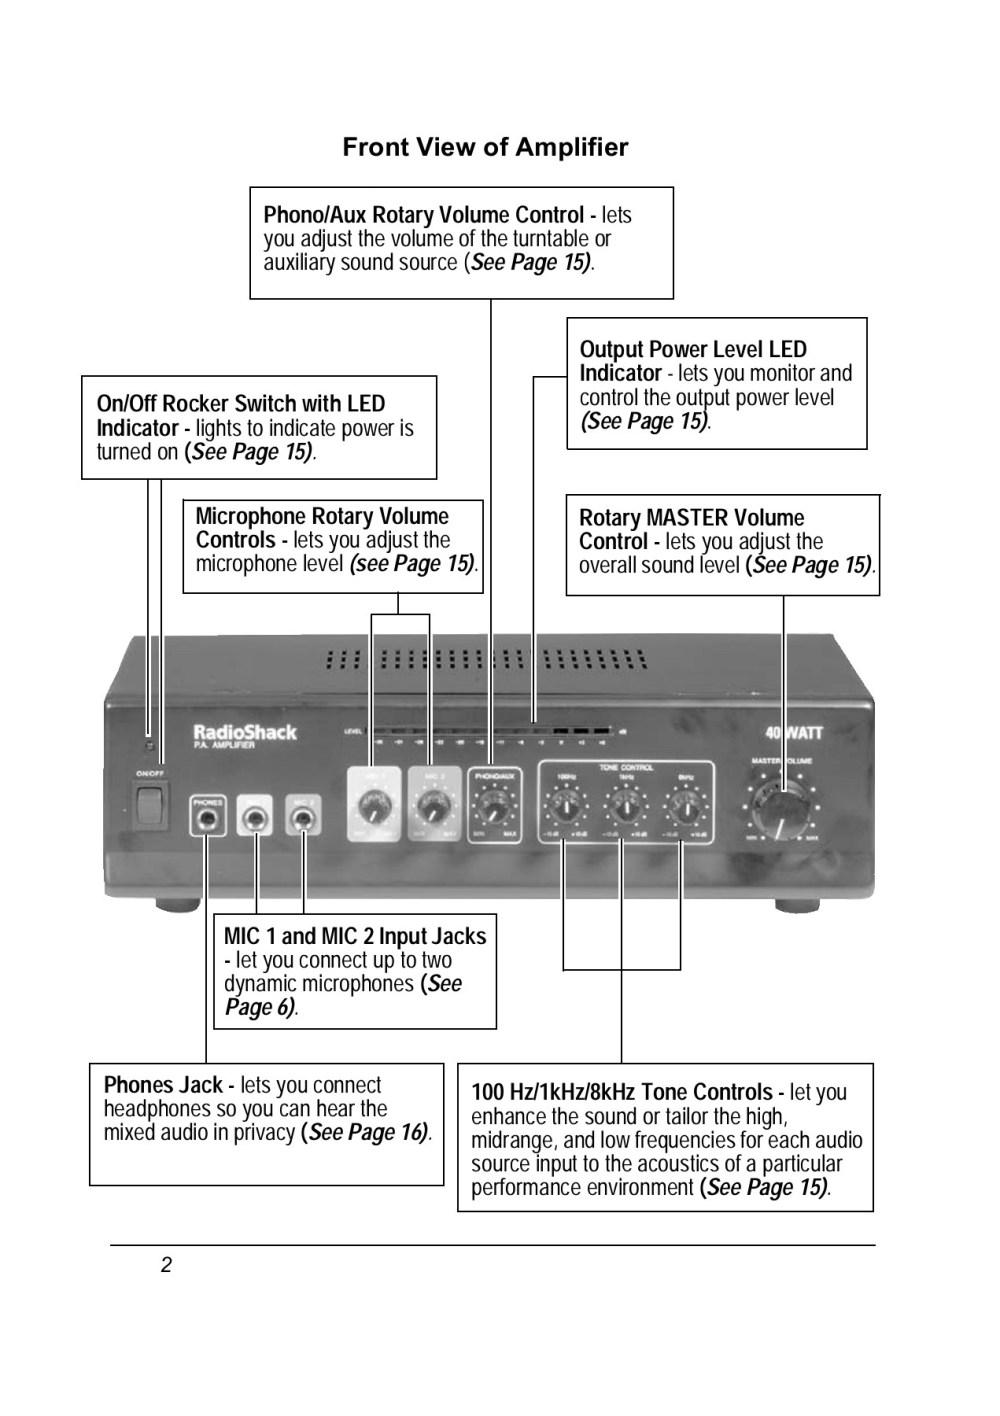 medium resolution of radio shack pa manual 3202054 pm en pages 1 20 text version anyflip